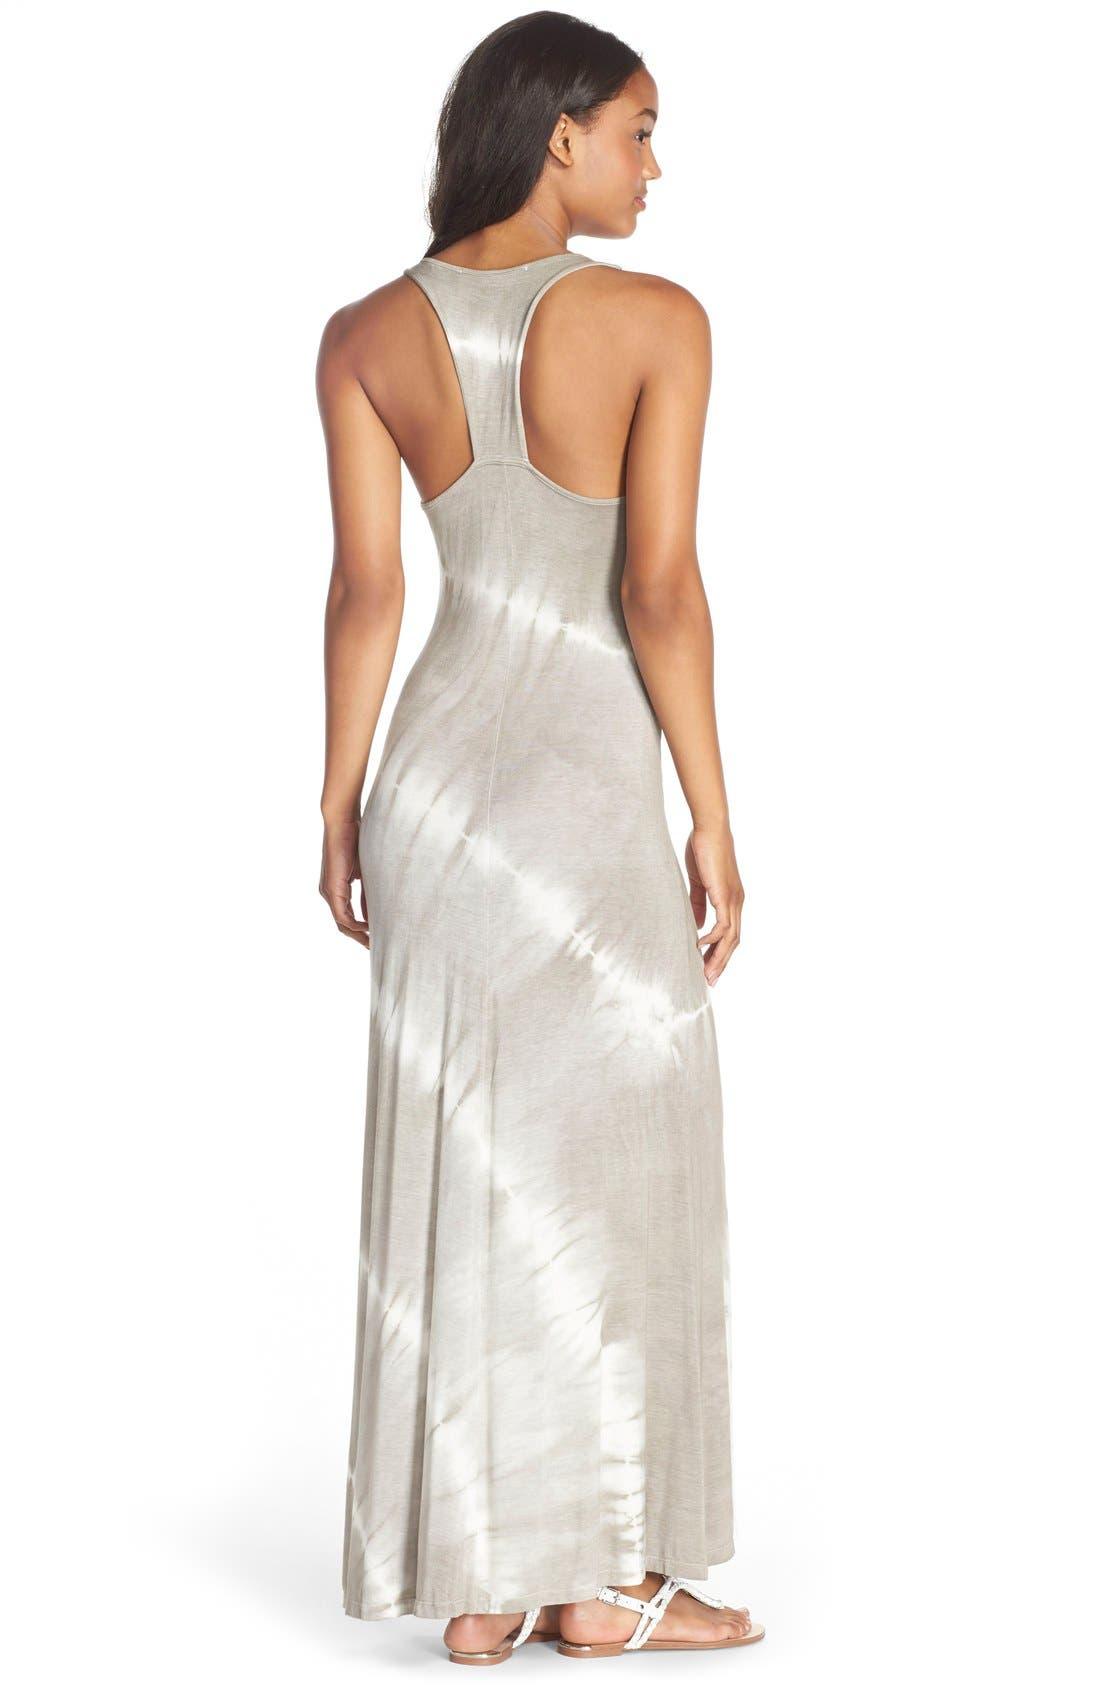 Tie Dye Racerback Maxi Dress,                             Alternate thumbnail 8, color,                             GREY/ WHITE